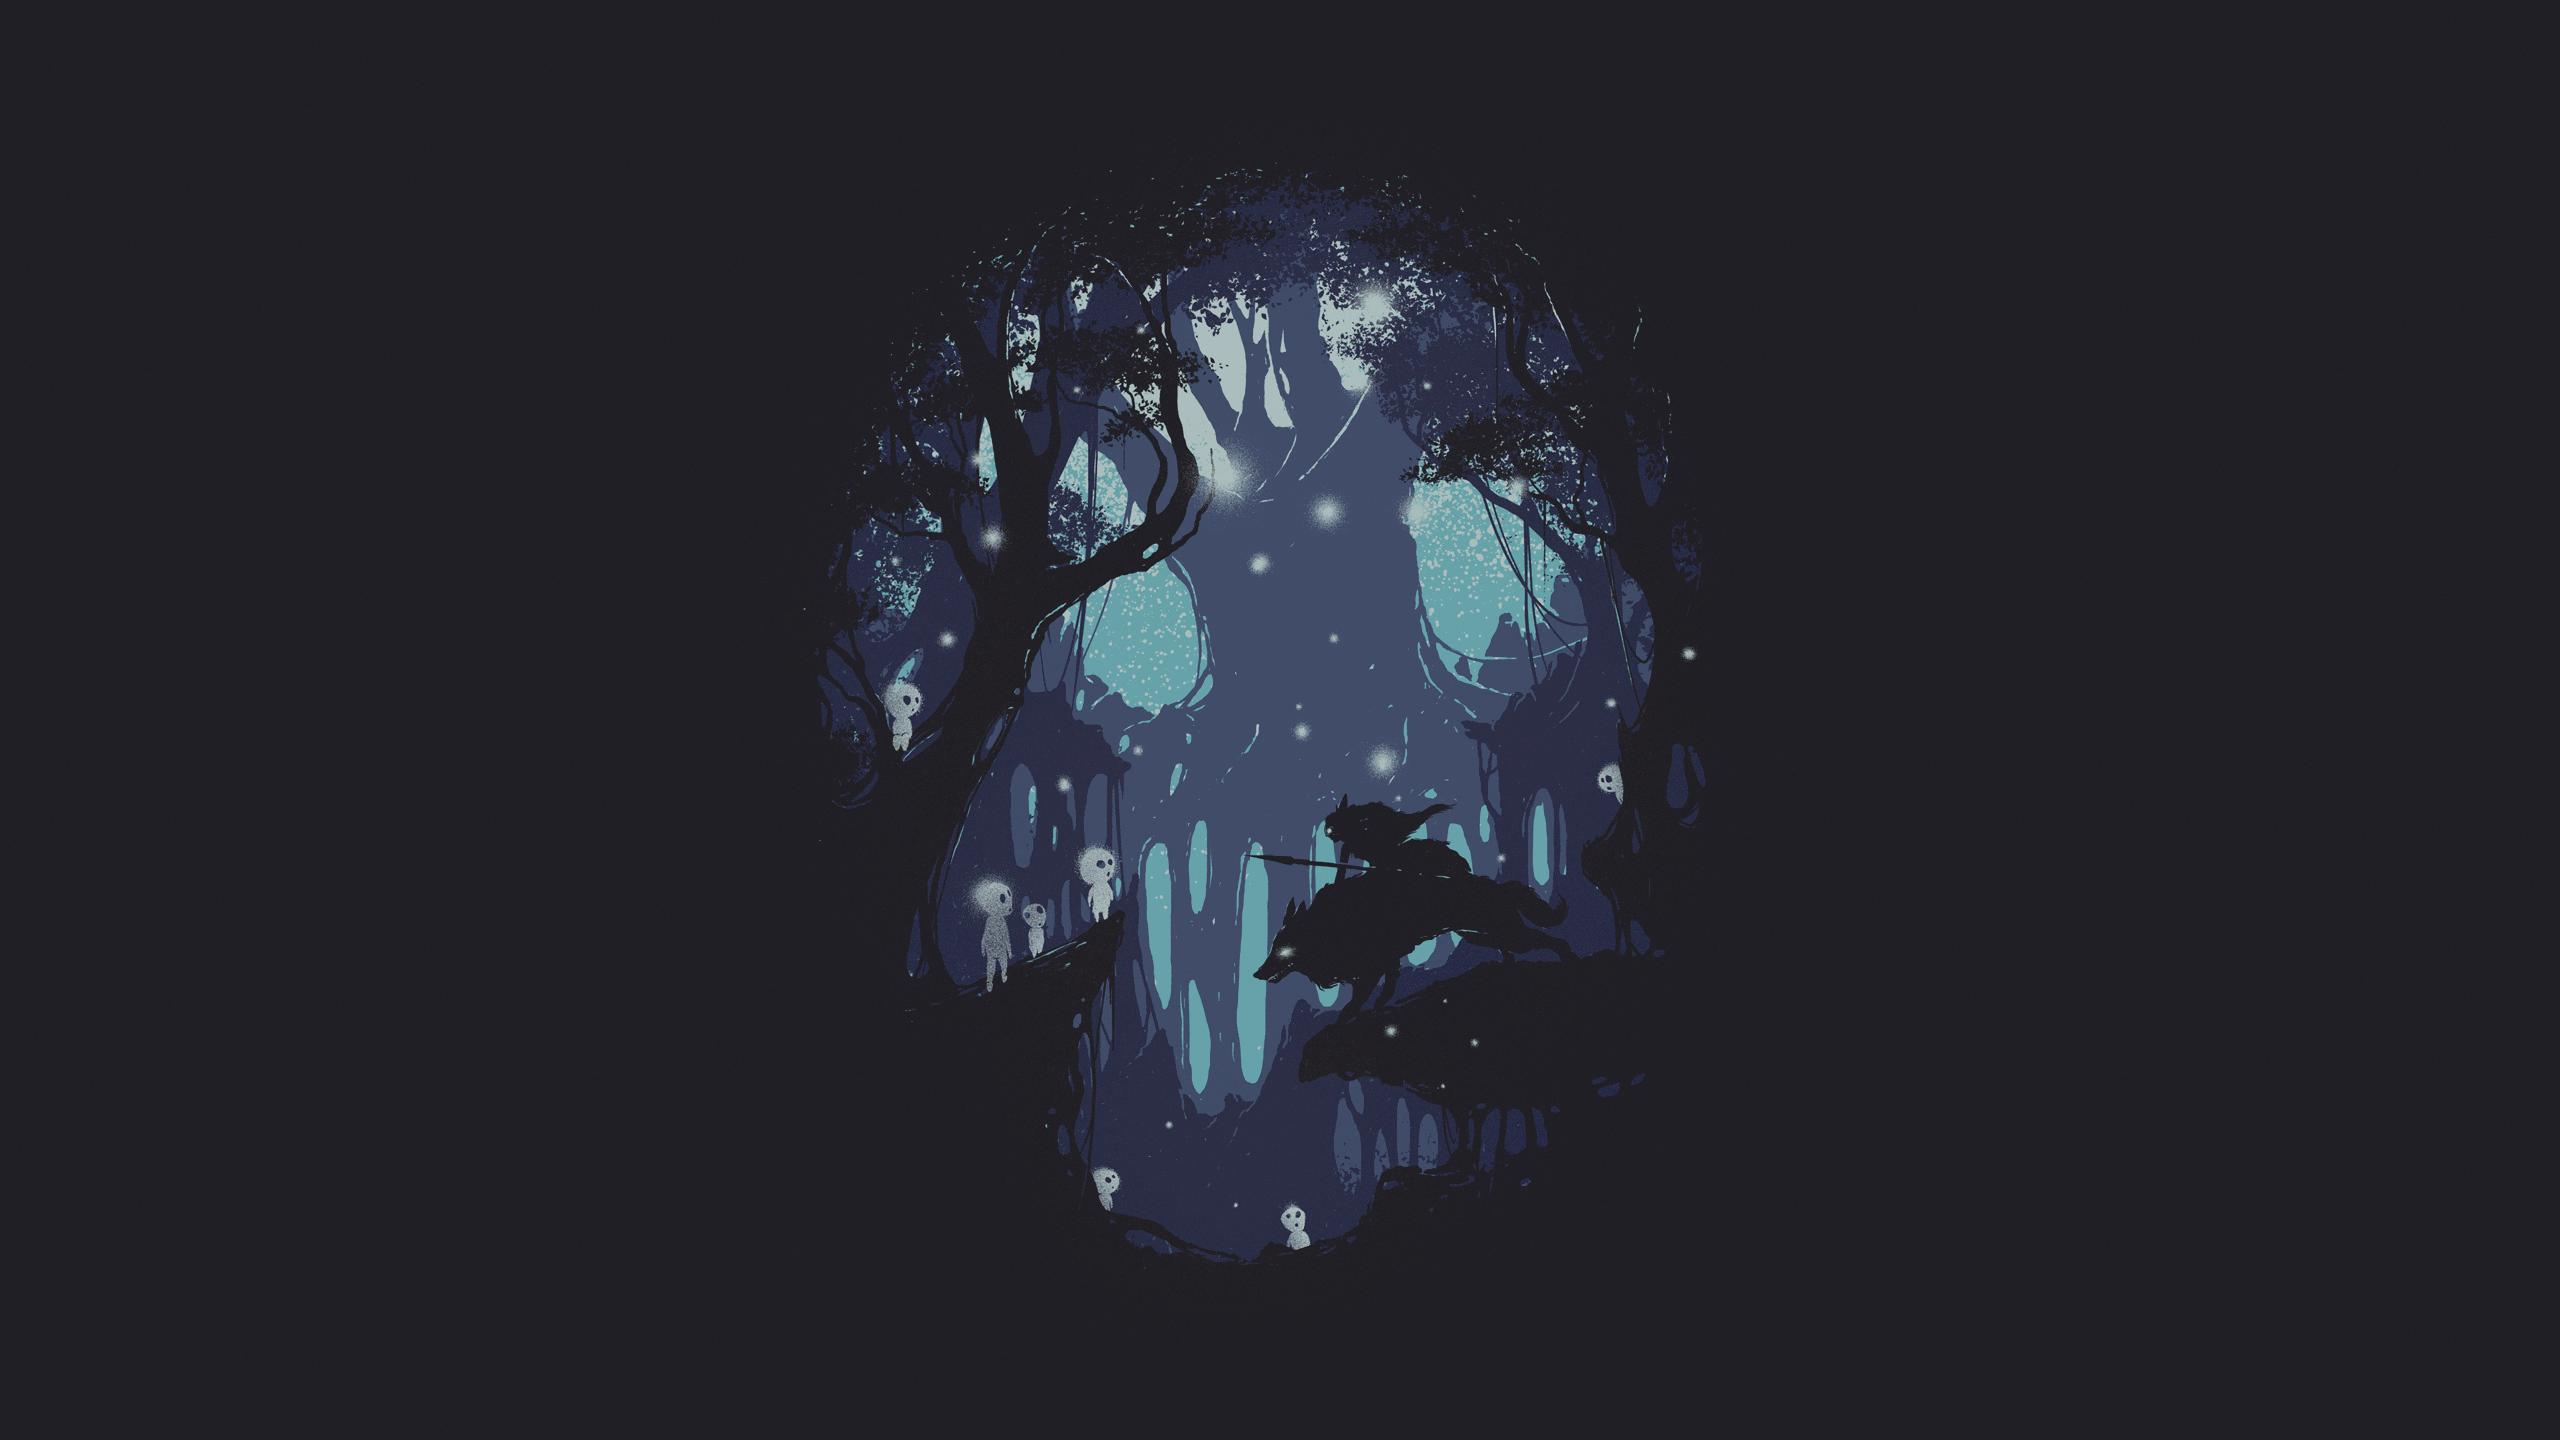 Anime 2560x1440 wolf dark silhouette trees Princess Mononoke forest